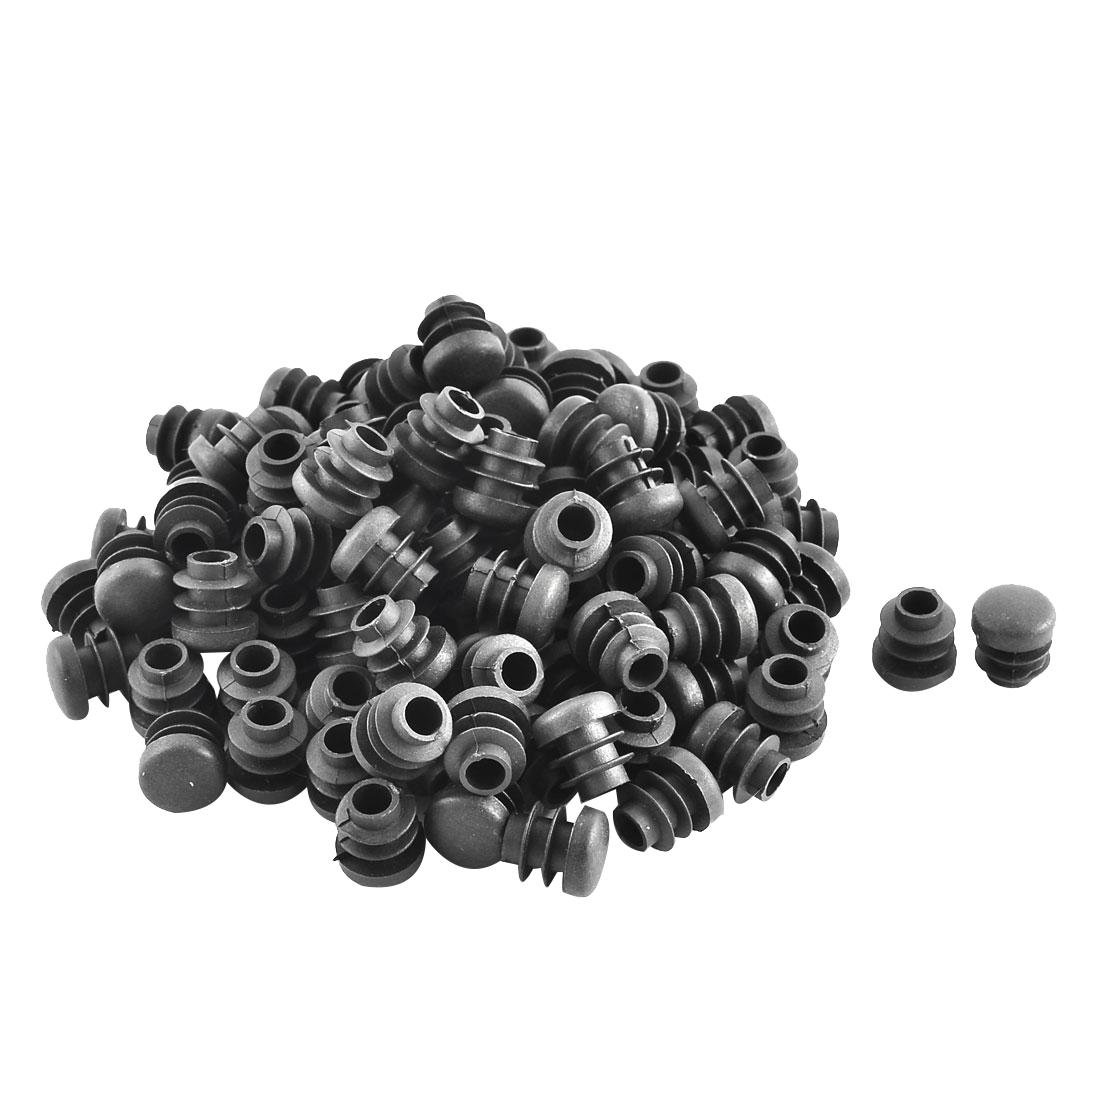 Plastic Round Ribbed Tube Inserts End Blanking Caps Black 14mm Diameter 100 Pcs